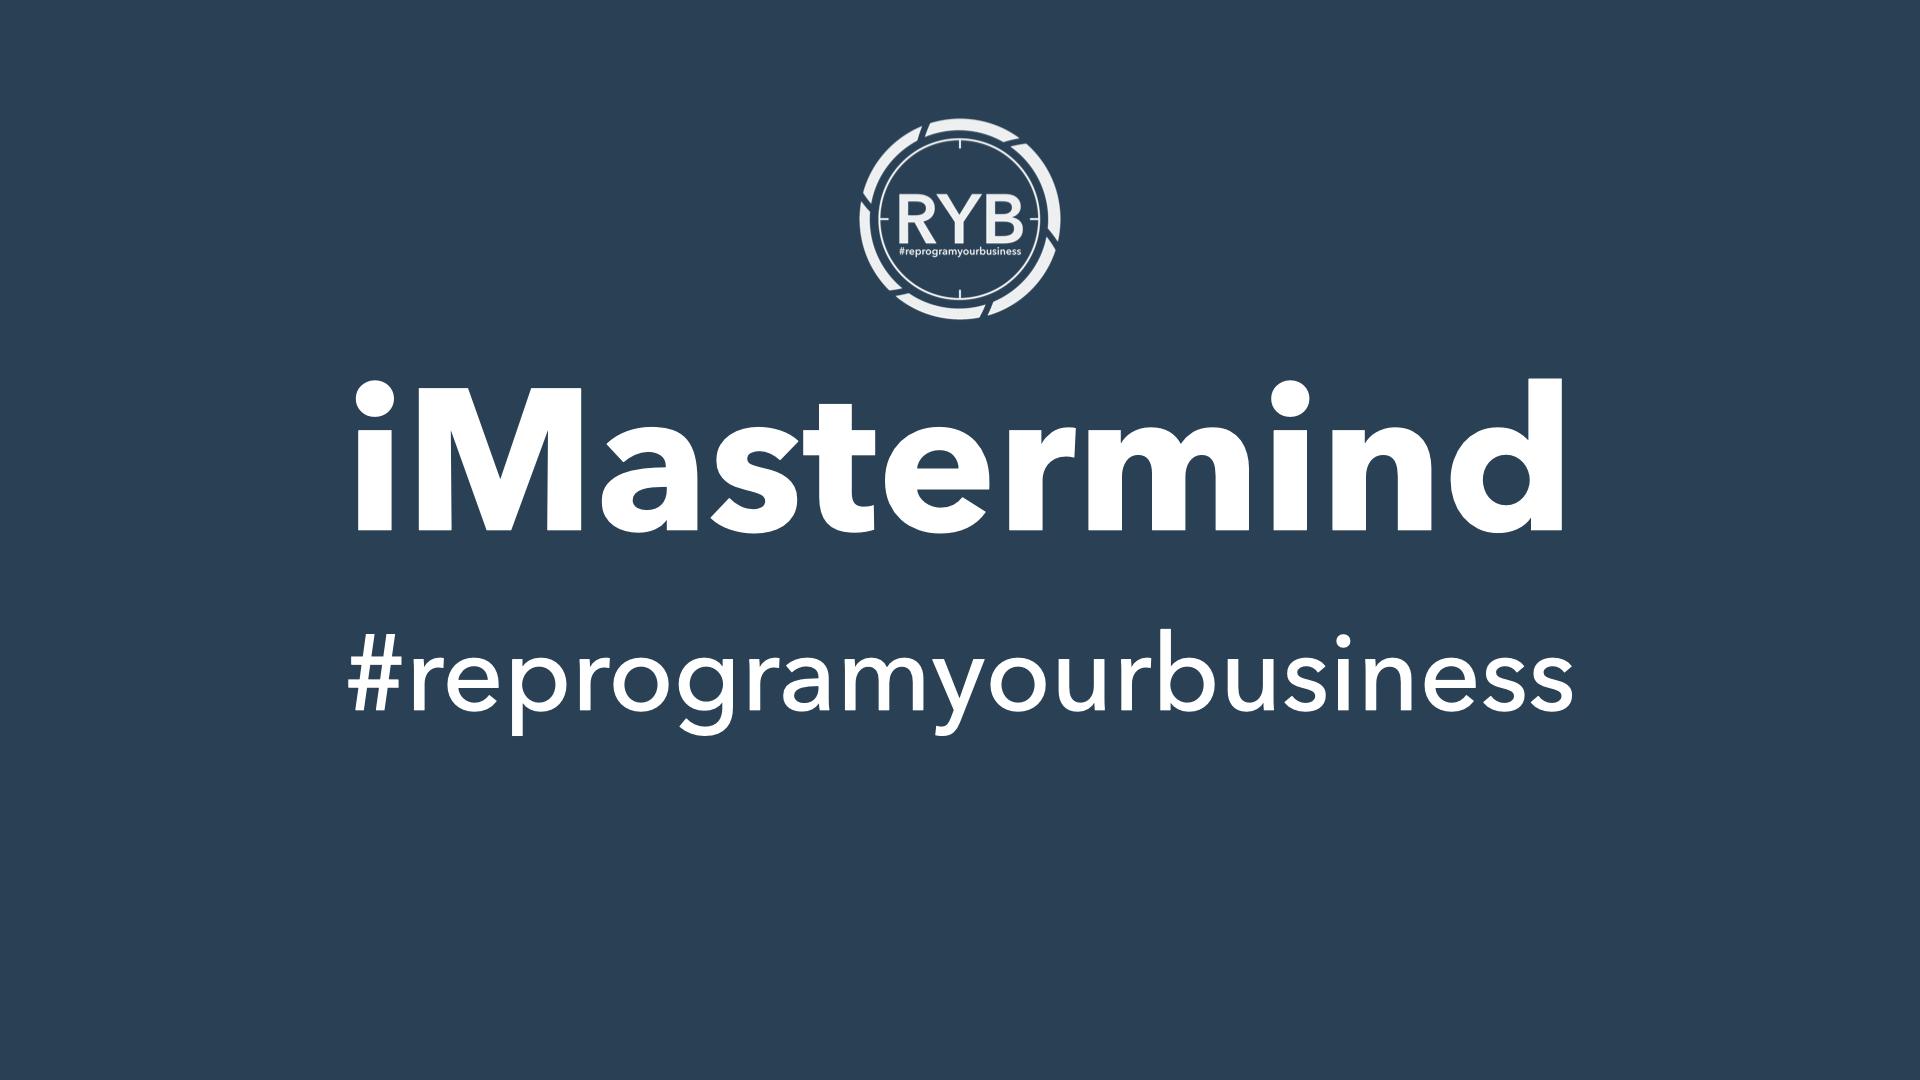 Jaarprogramma | iMastermind | #reprogramyourbusiness